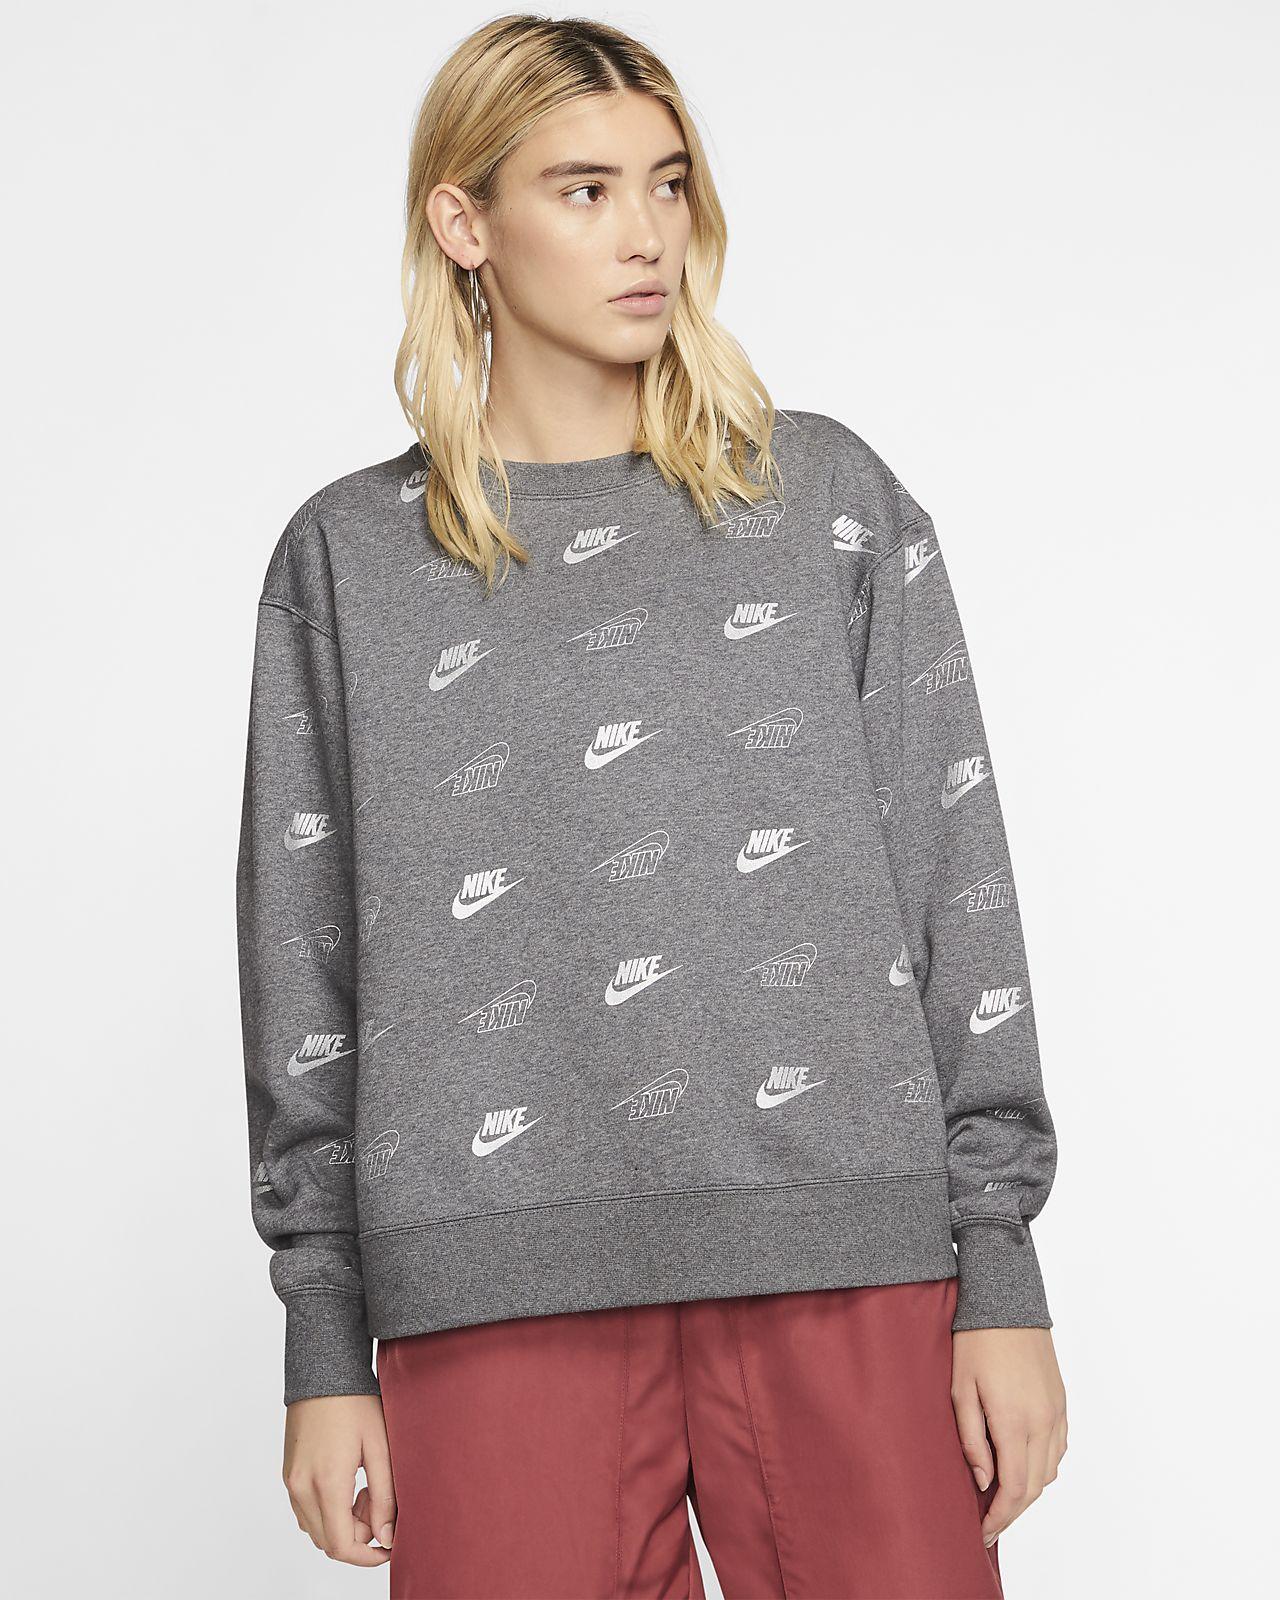 Nike Sportswear Damesshirt met ronde hals